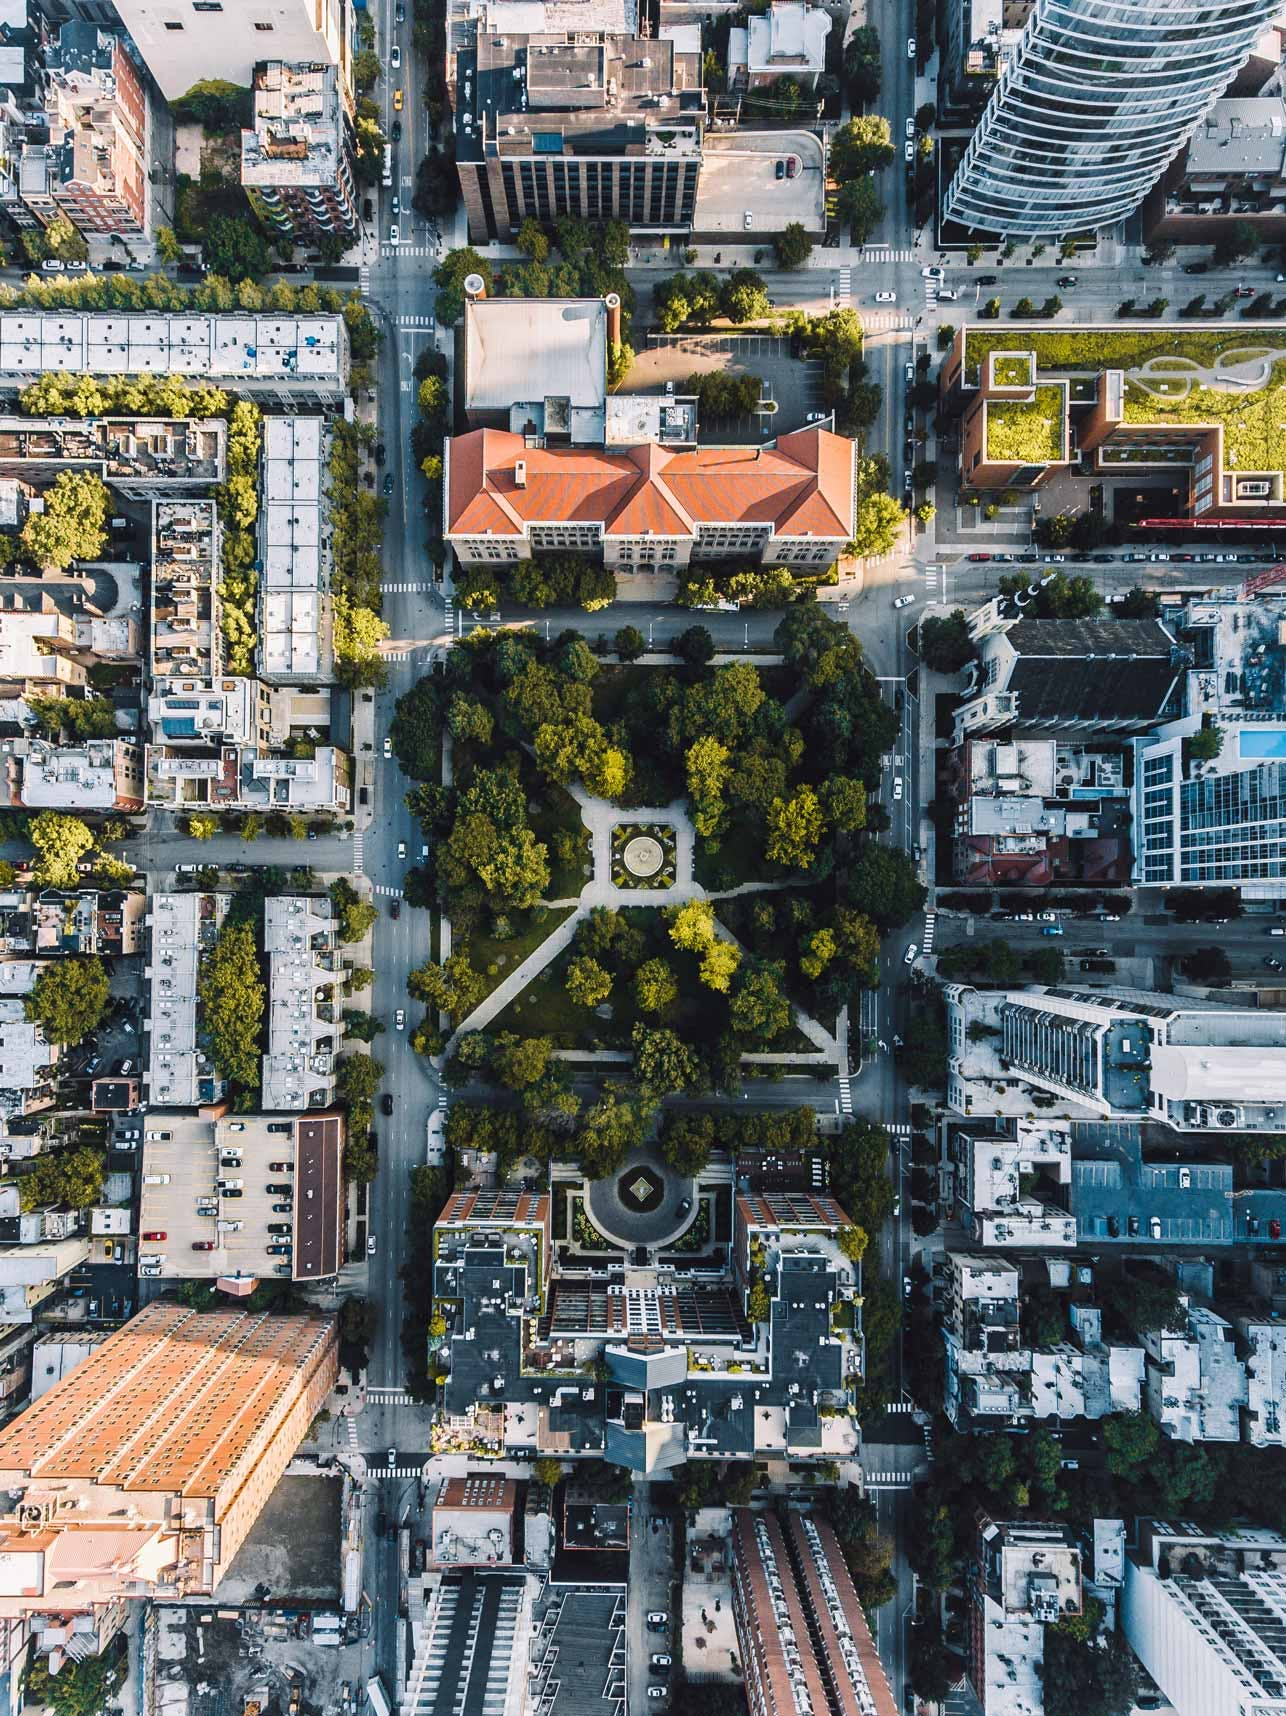 Washington Park Look Down